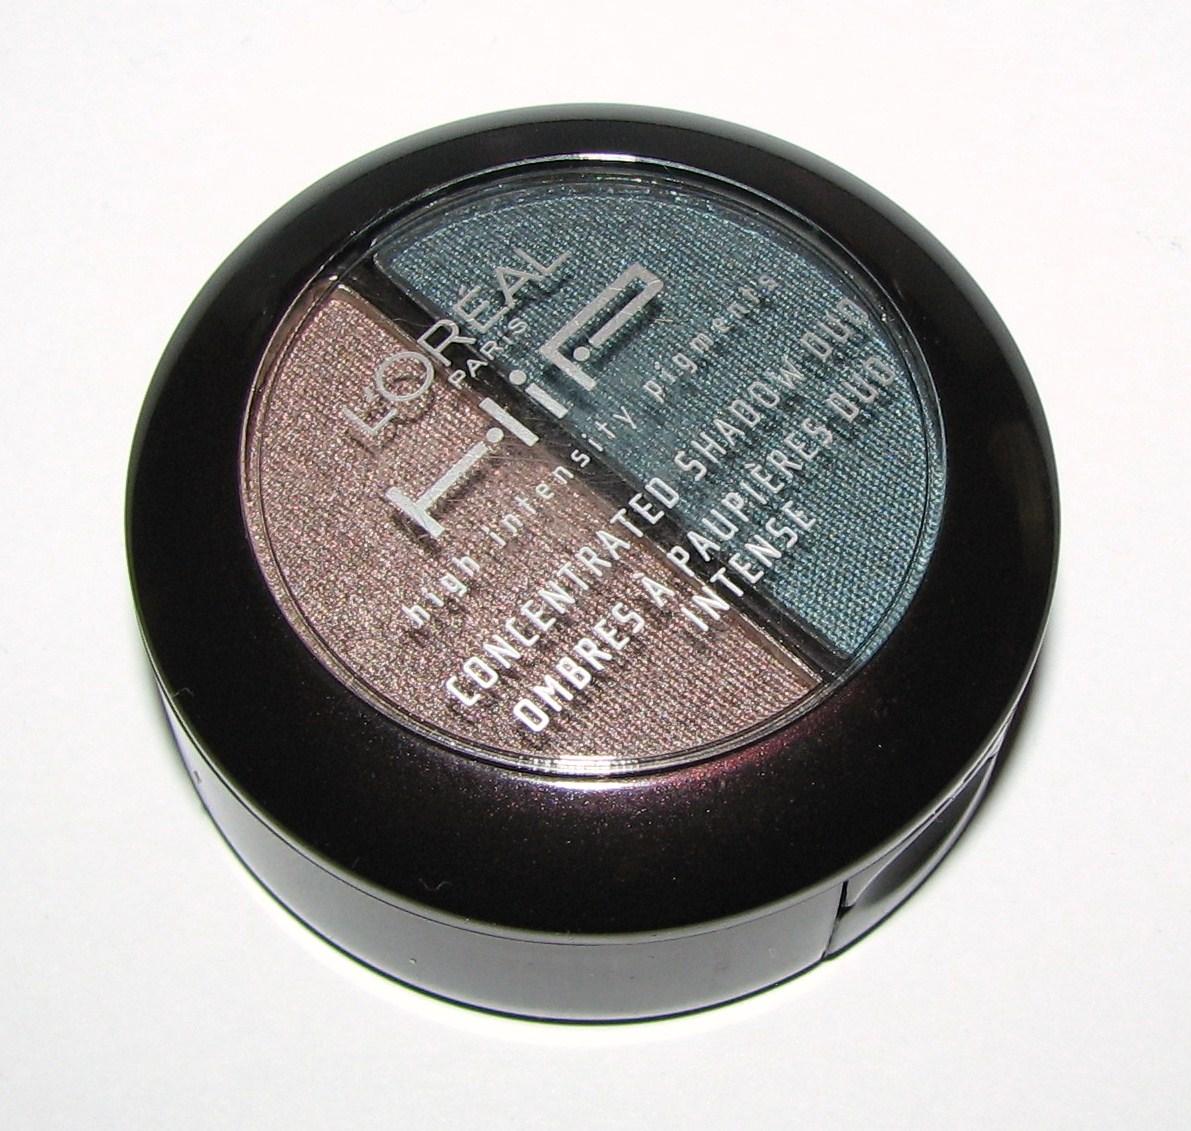 L'Oreal SASSY HiP Studio Secrets Professional Metallic Eye Shadow ...